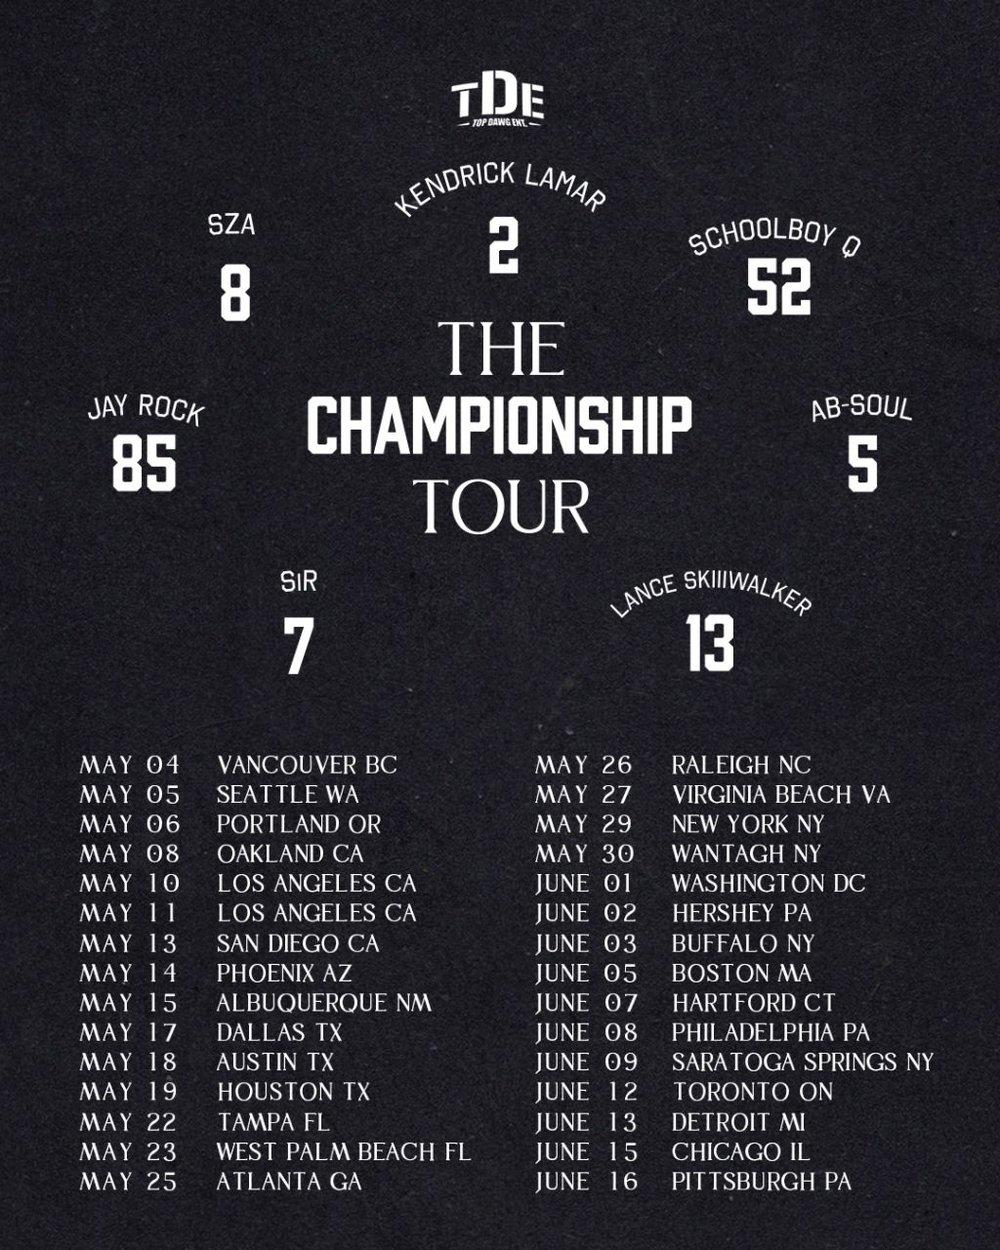 TDE-The-Championship-Tour.jpg